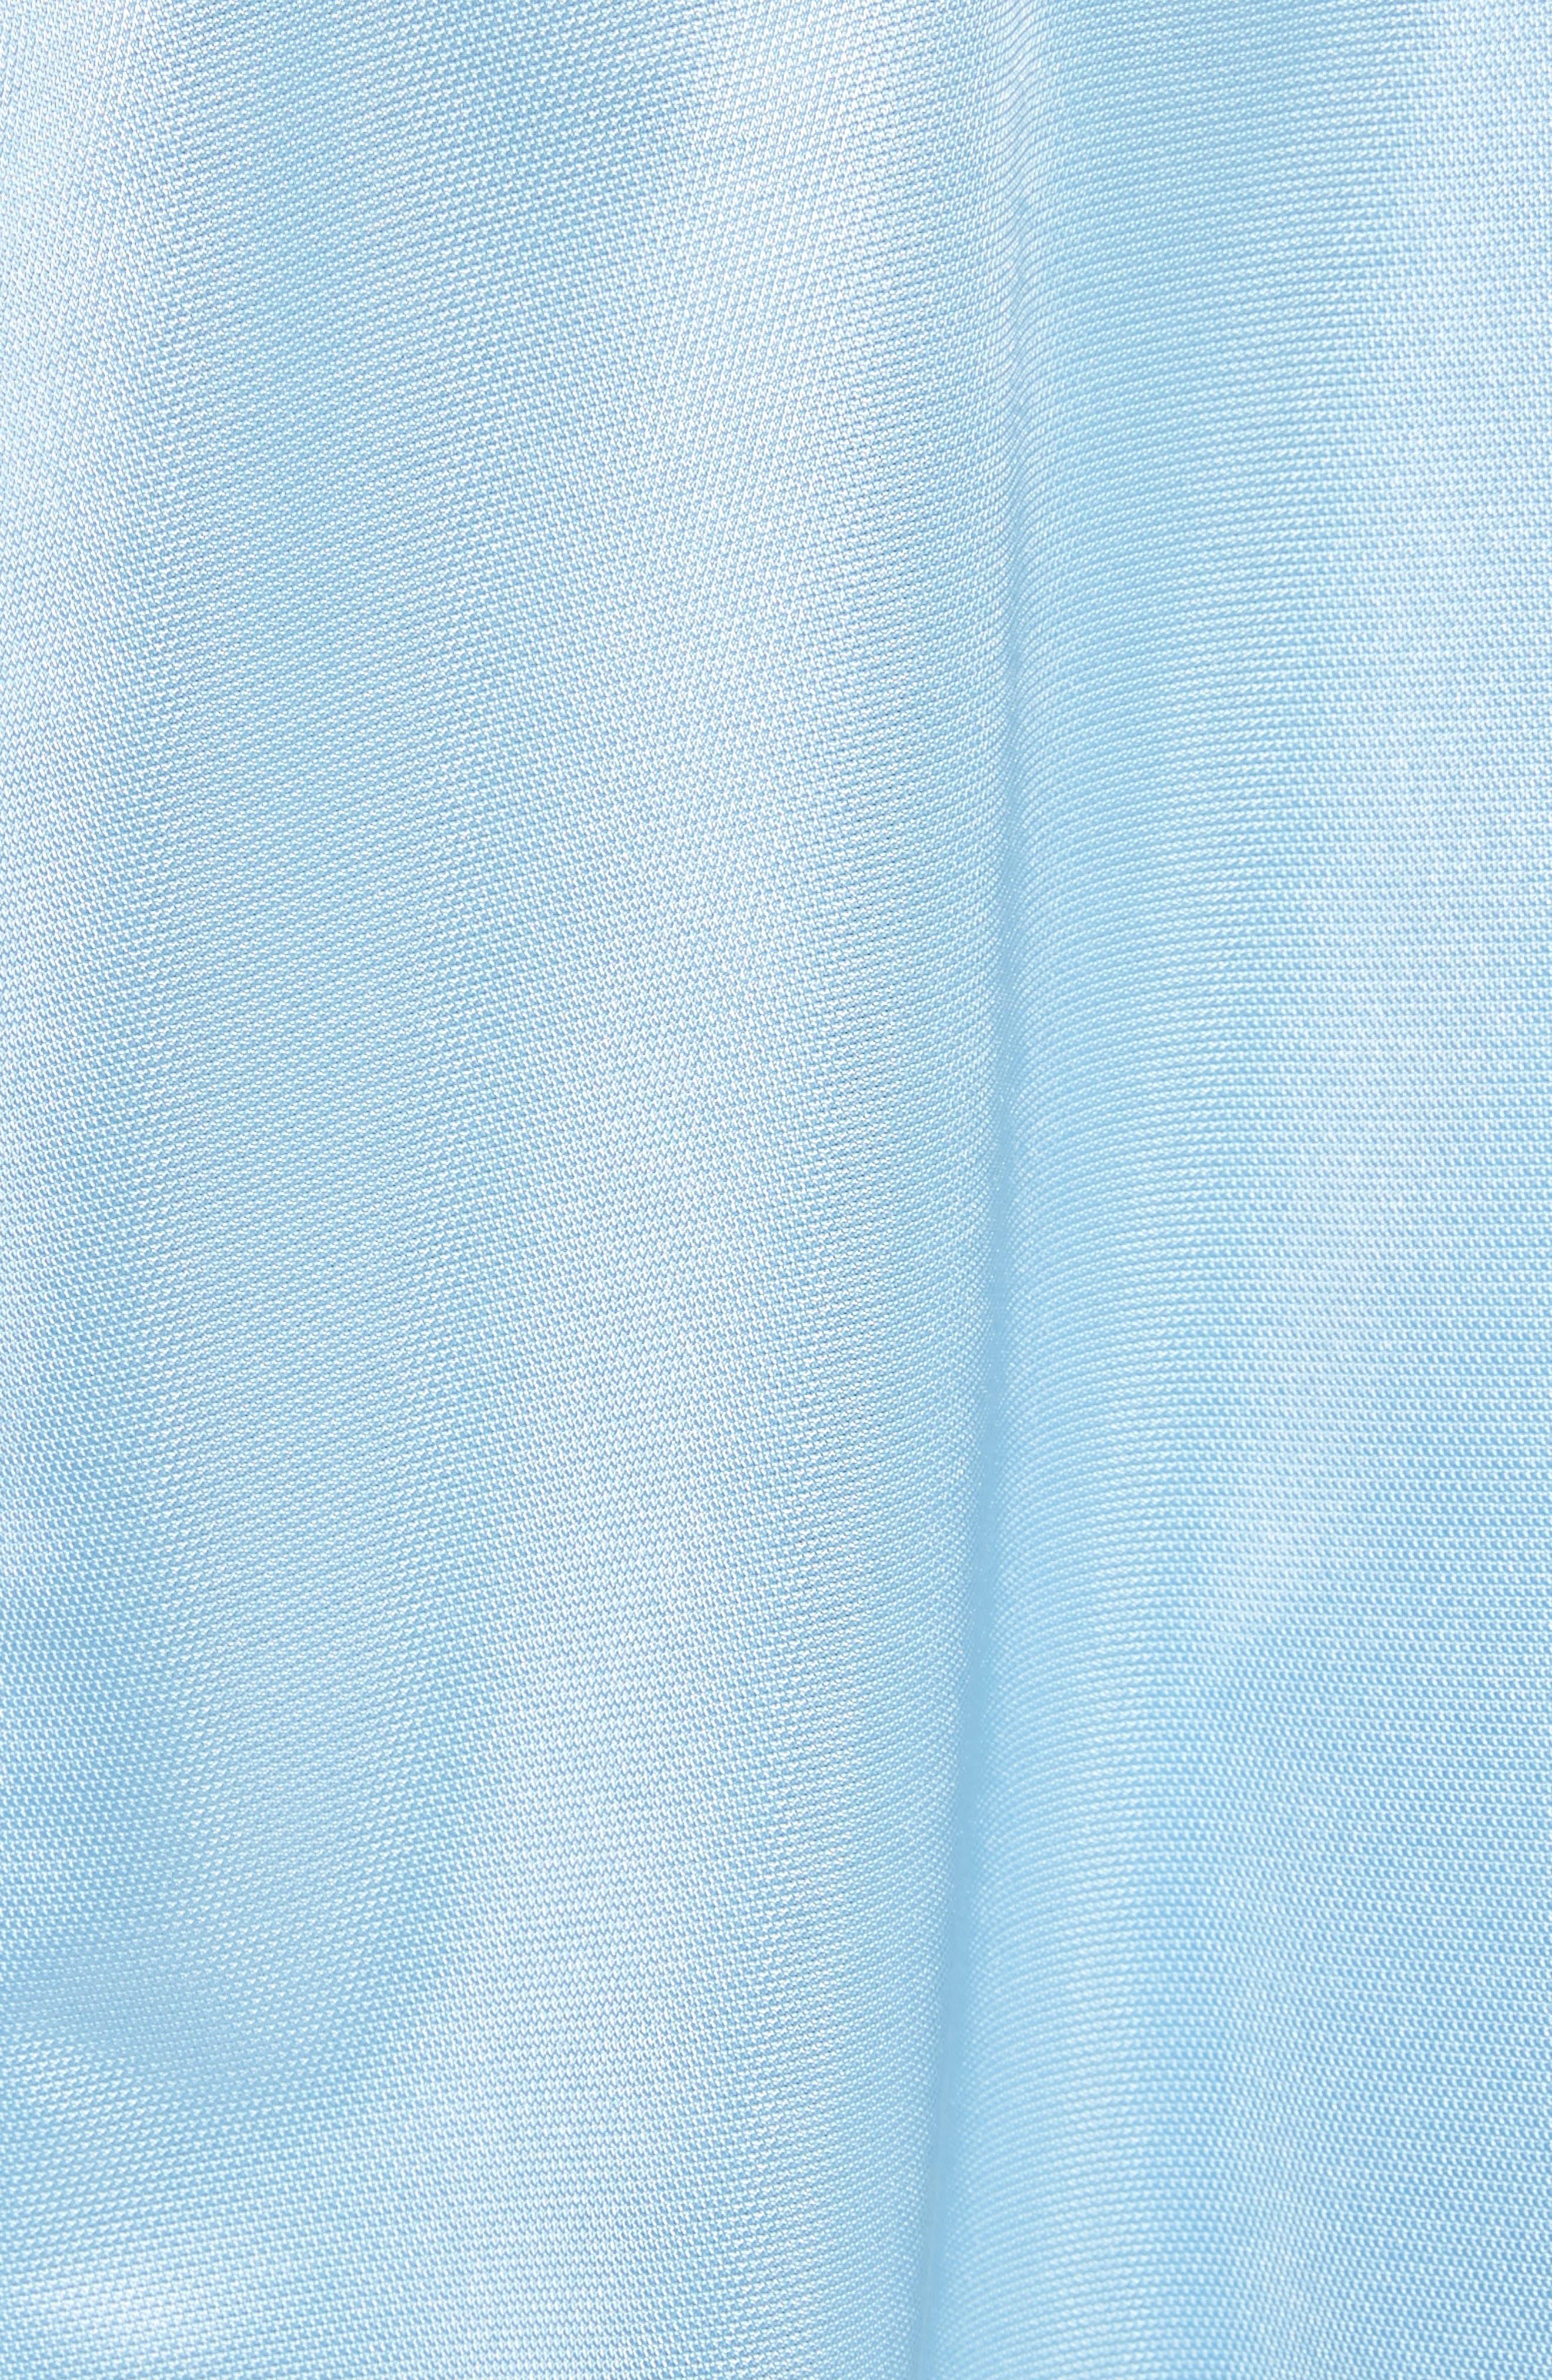 Dolman Sleeve Top,                             Alternate thumbnail 5, color,                             401